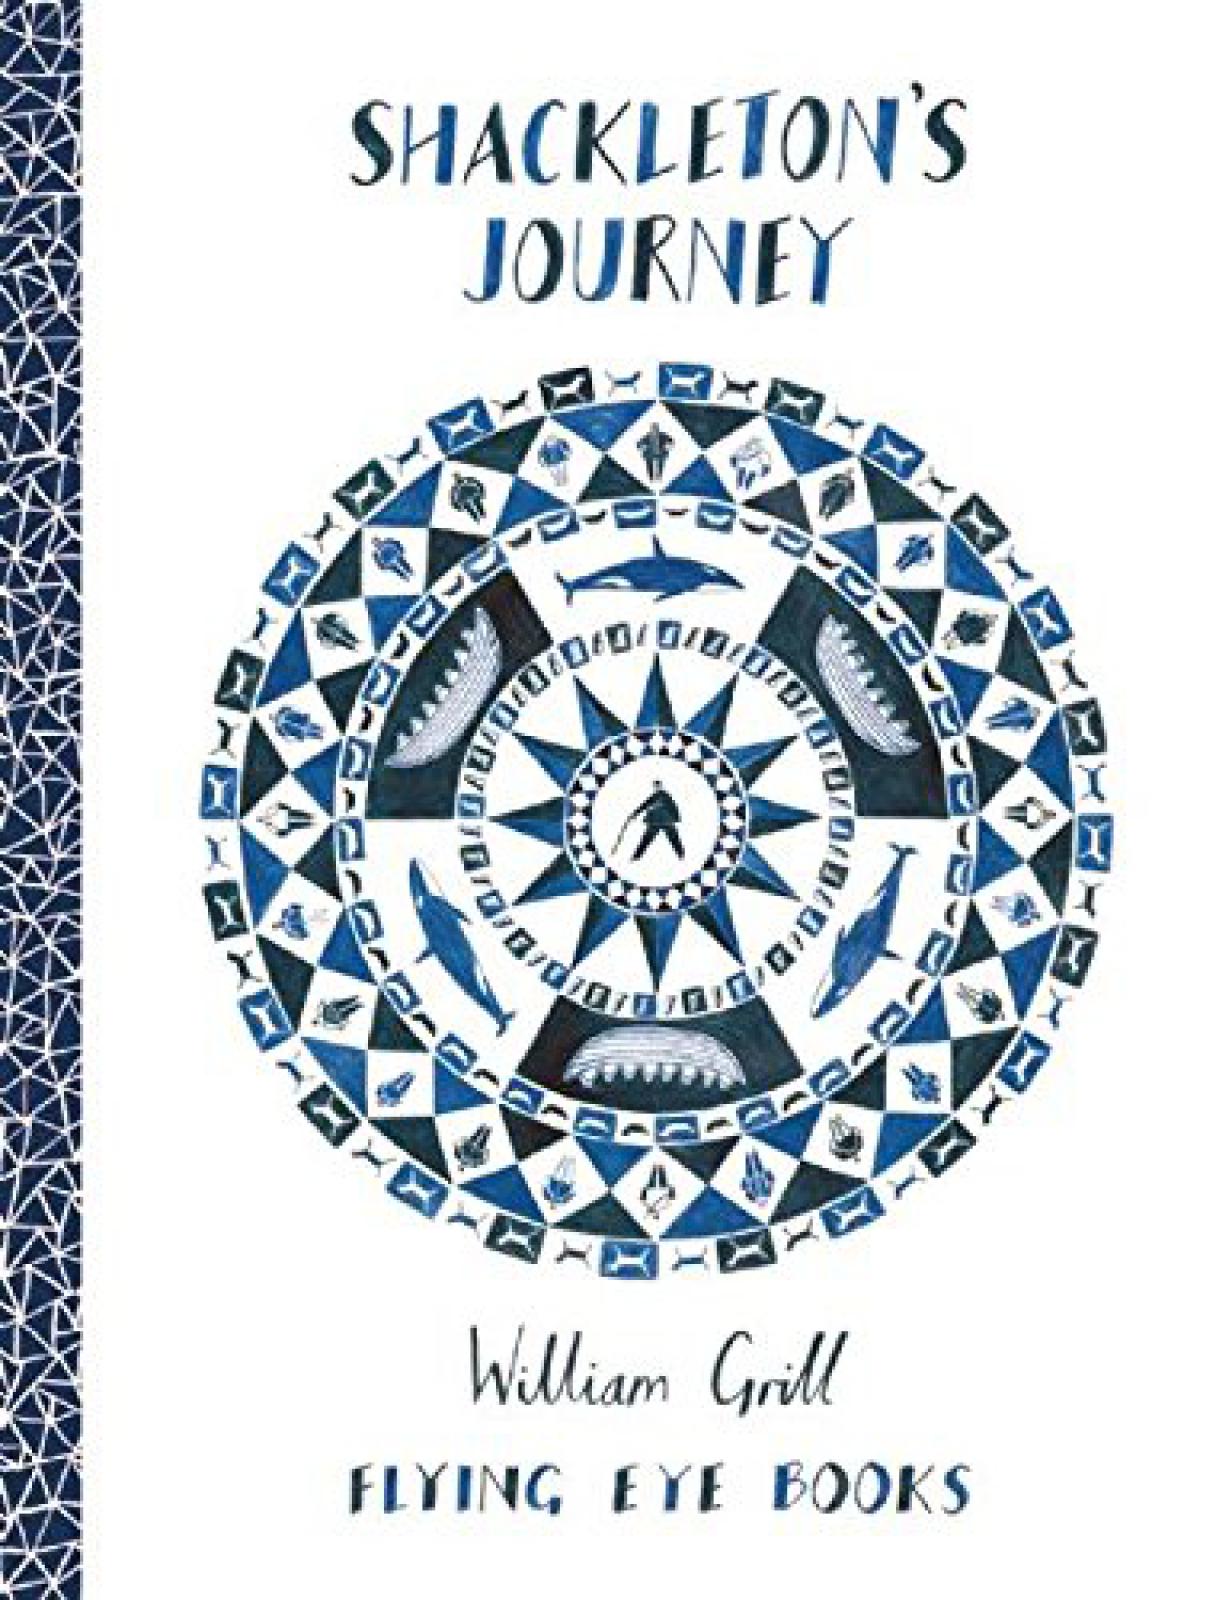 Shackleton's Journey By William Grill Hardback Book